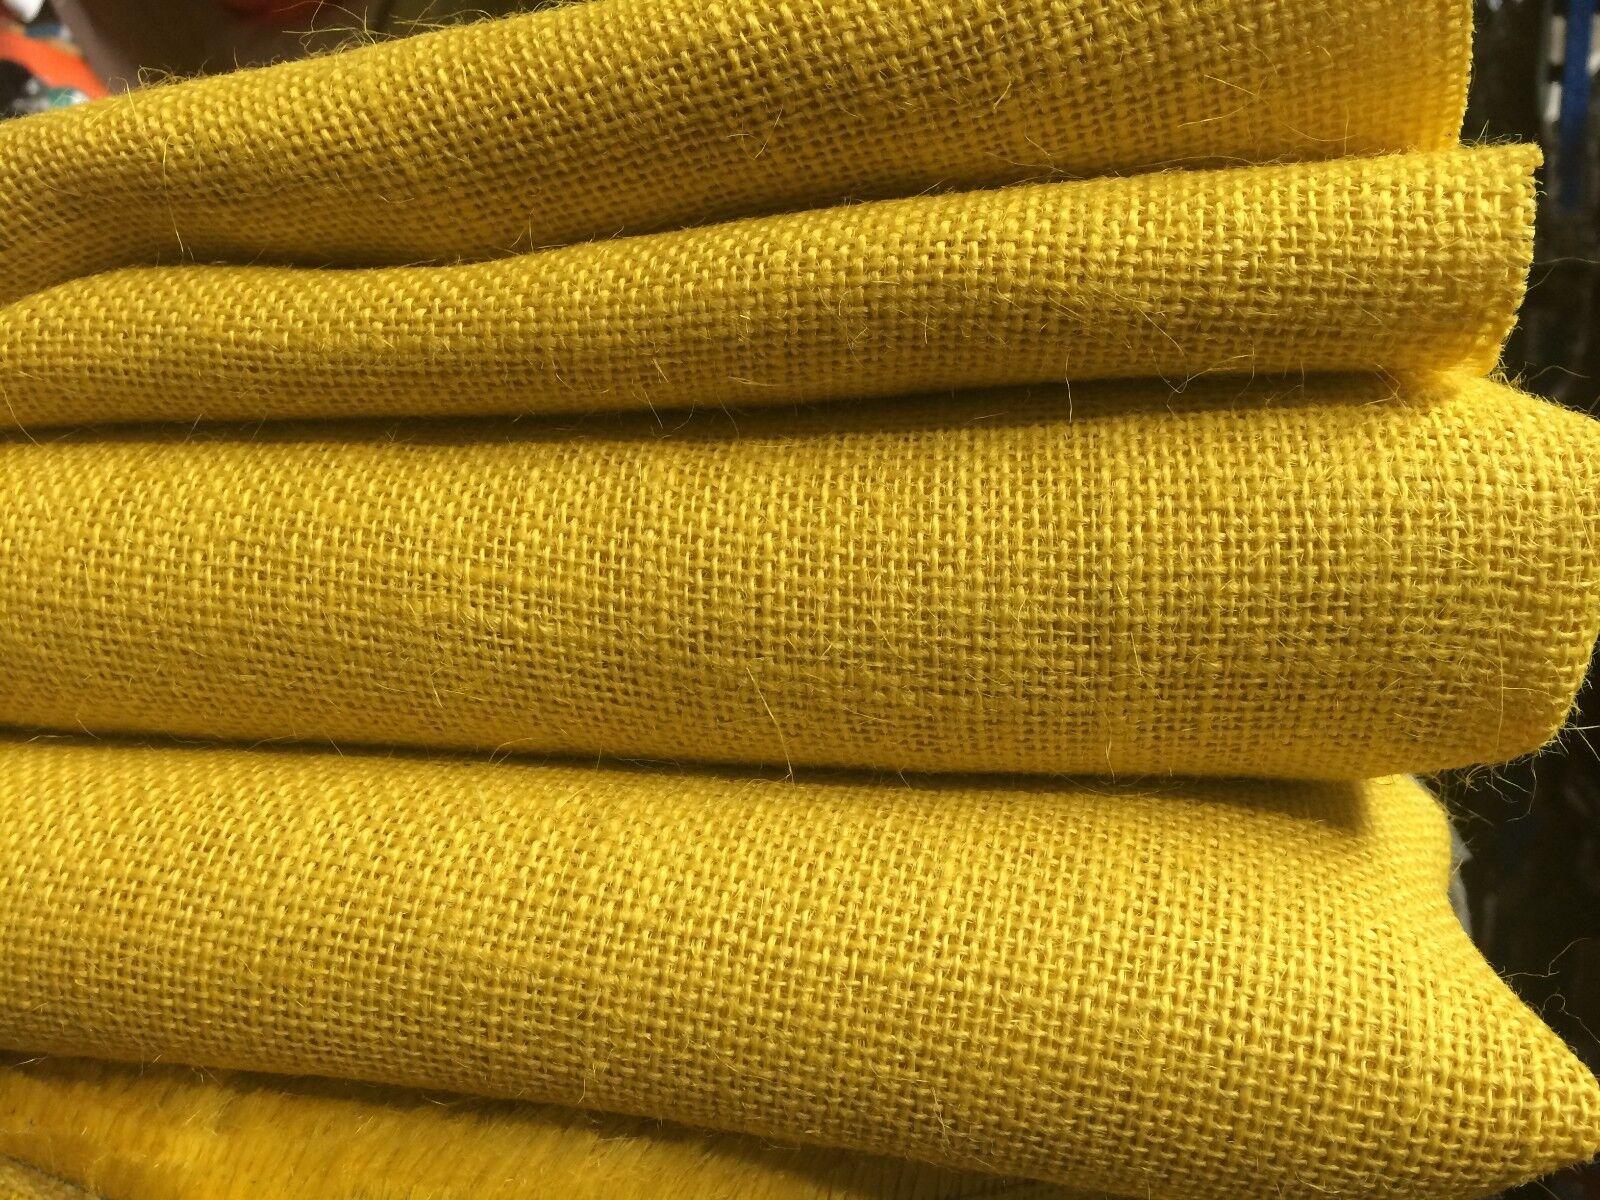 MUSTARD HESSIAN JUTE 10oz Fabric Sacking Gelb Table Runner Material 160cm wide